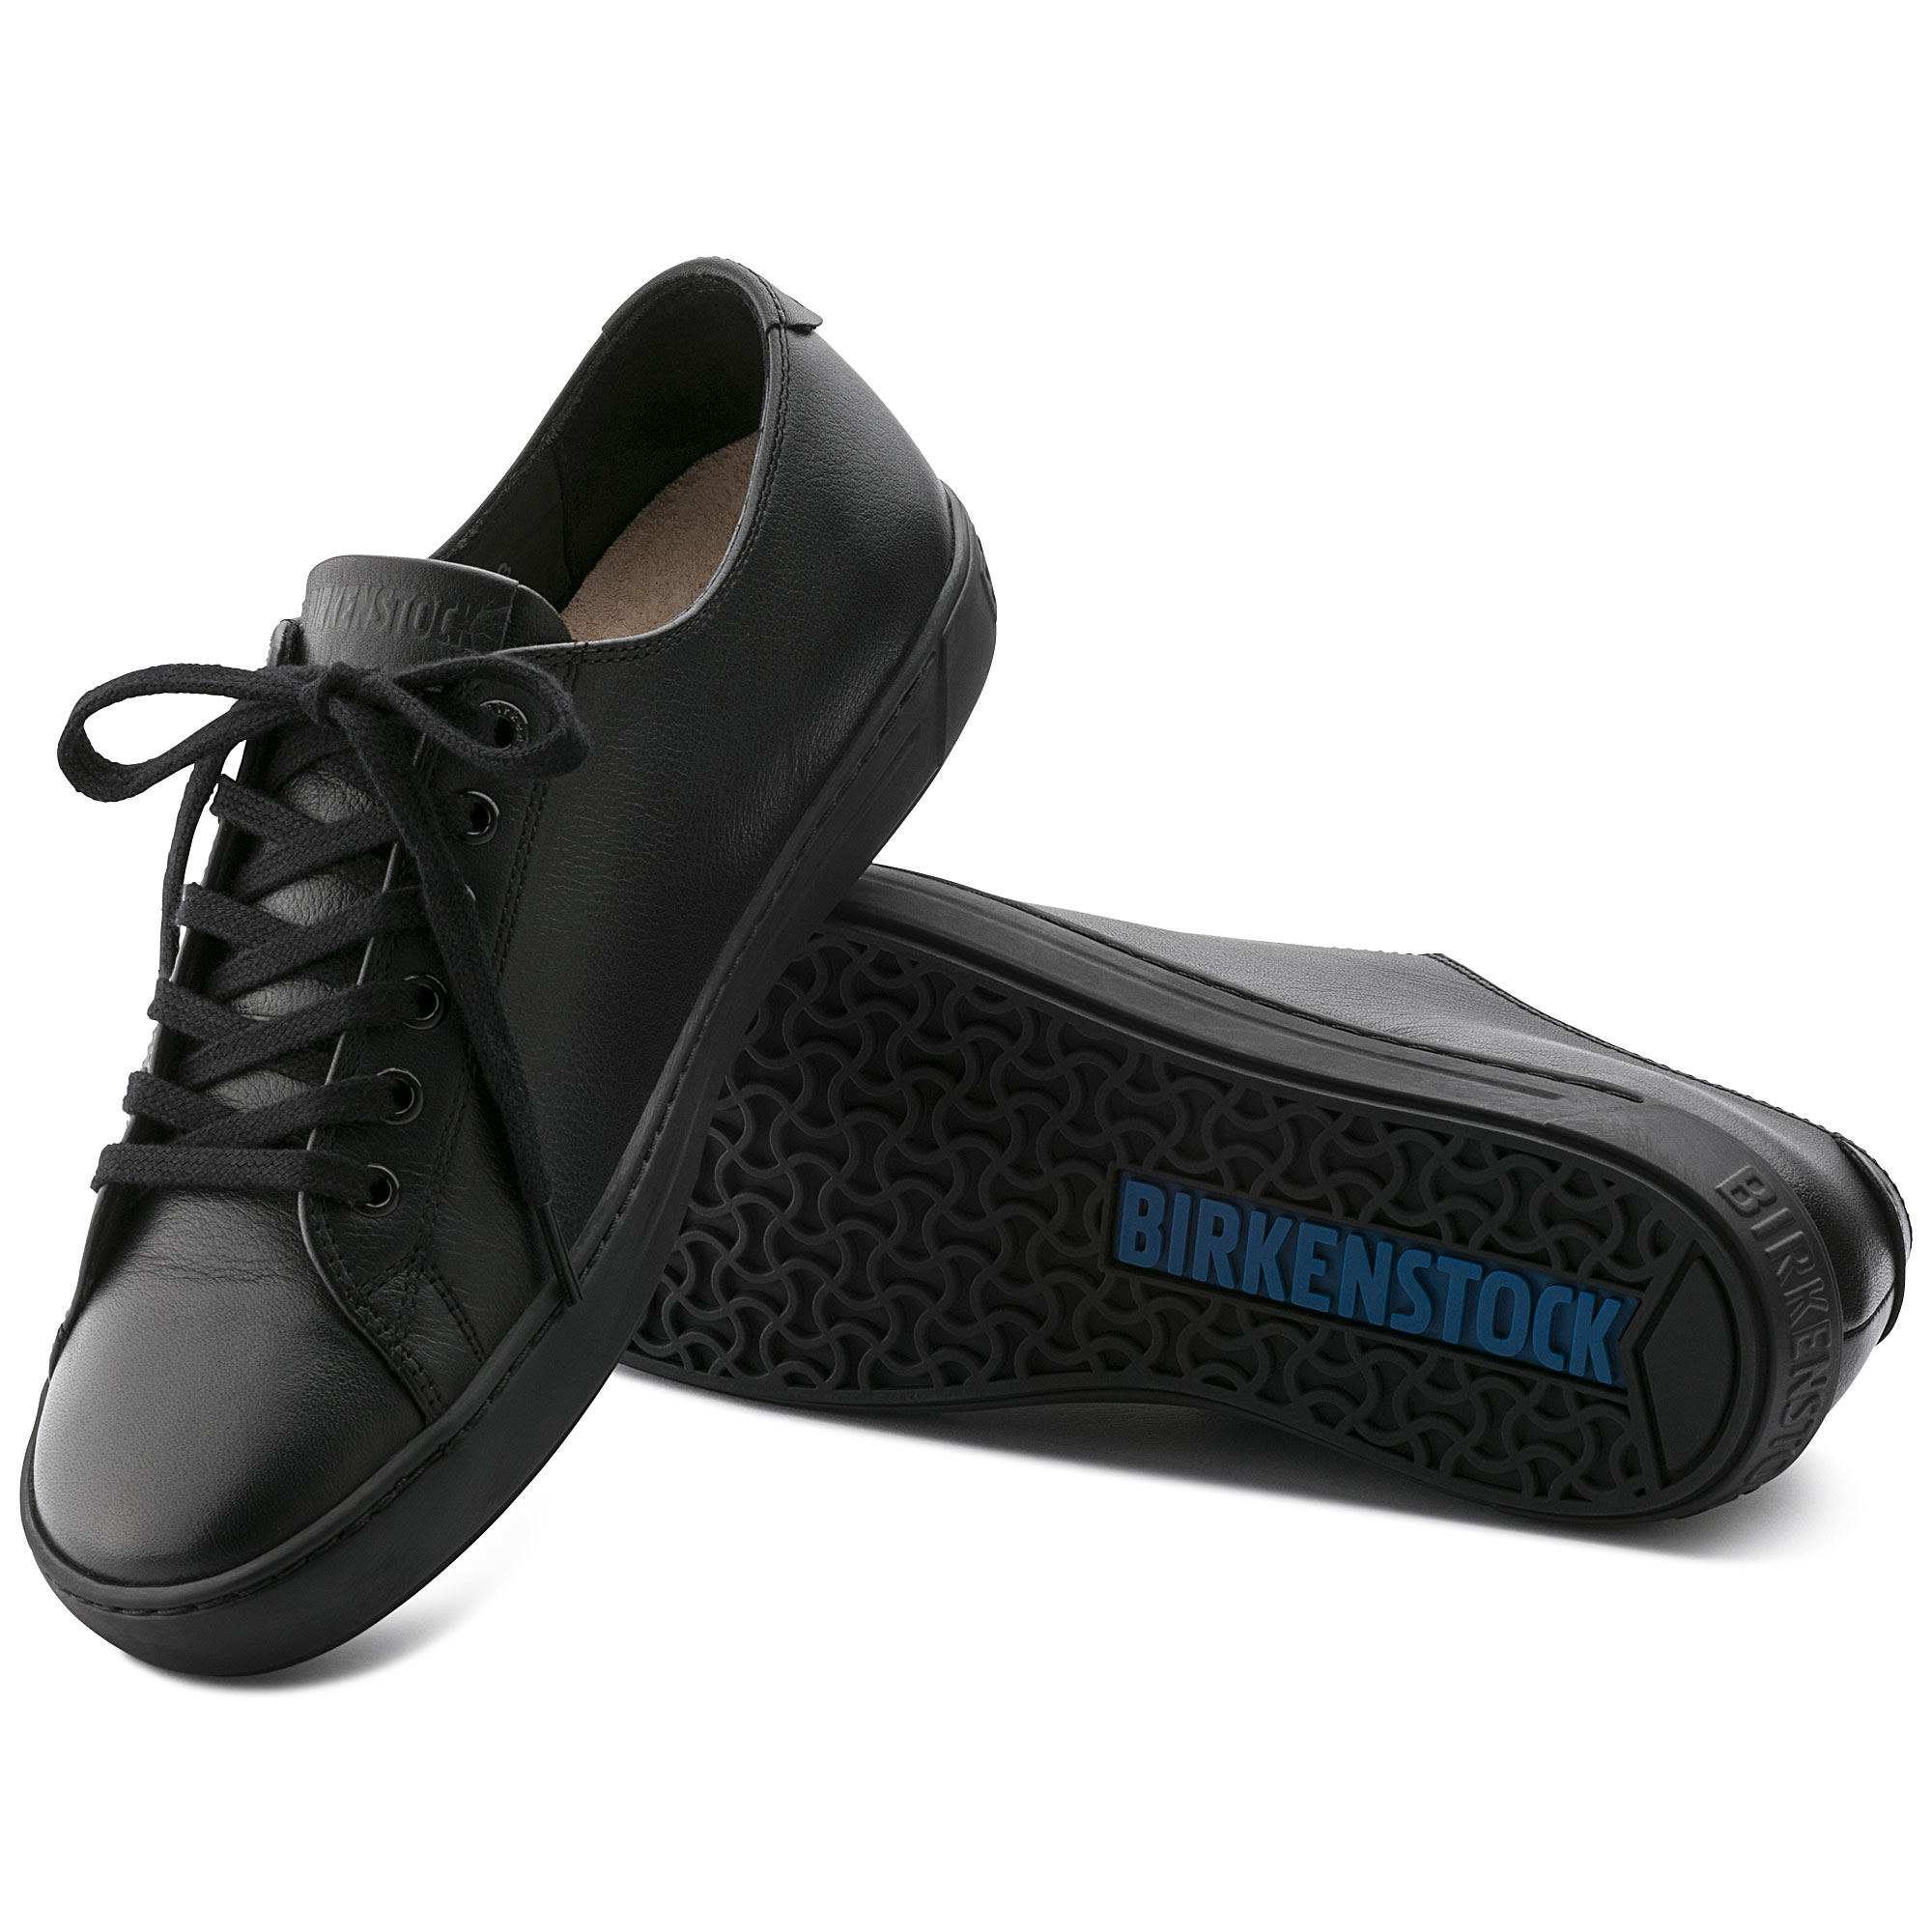 Arran Natural Leather Black | shop